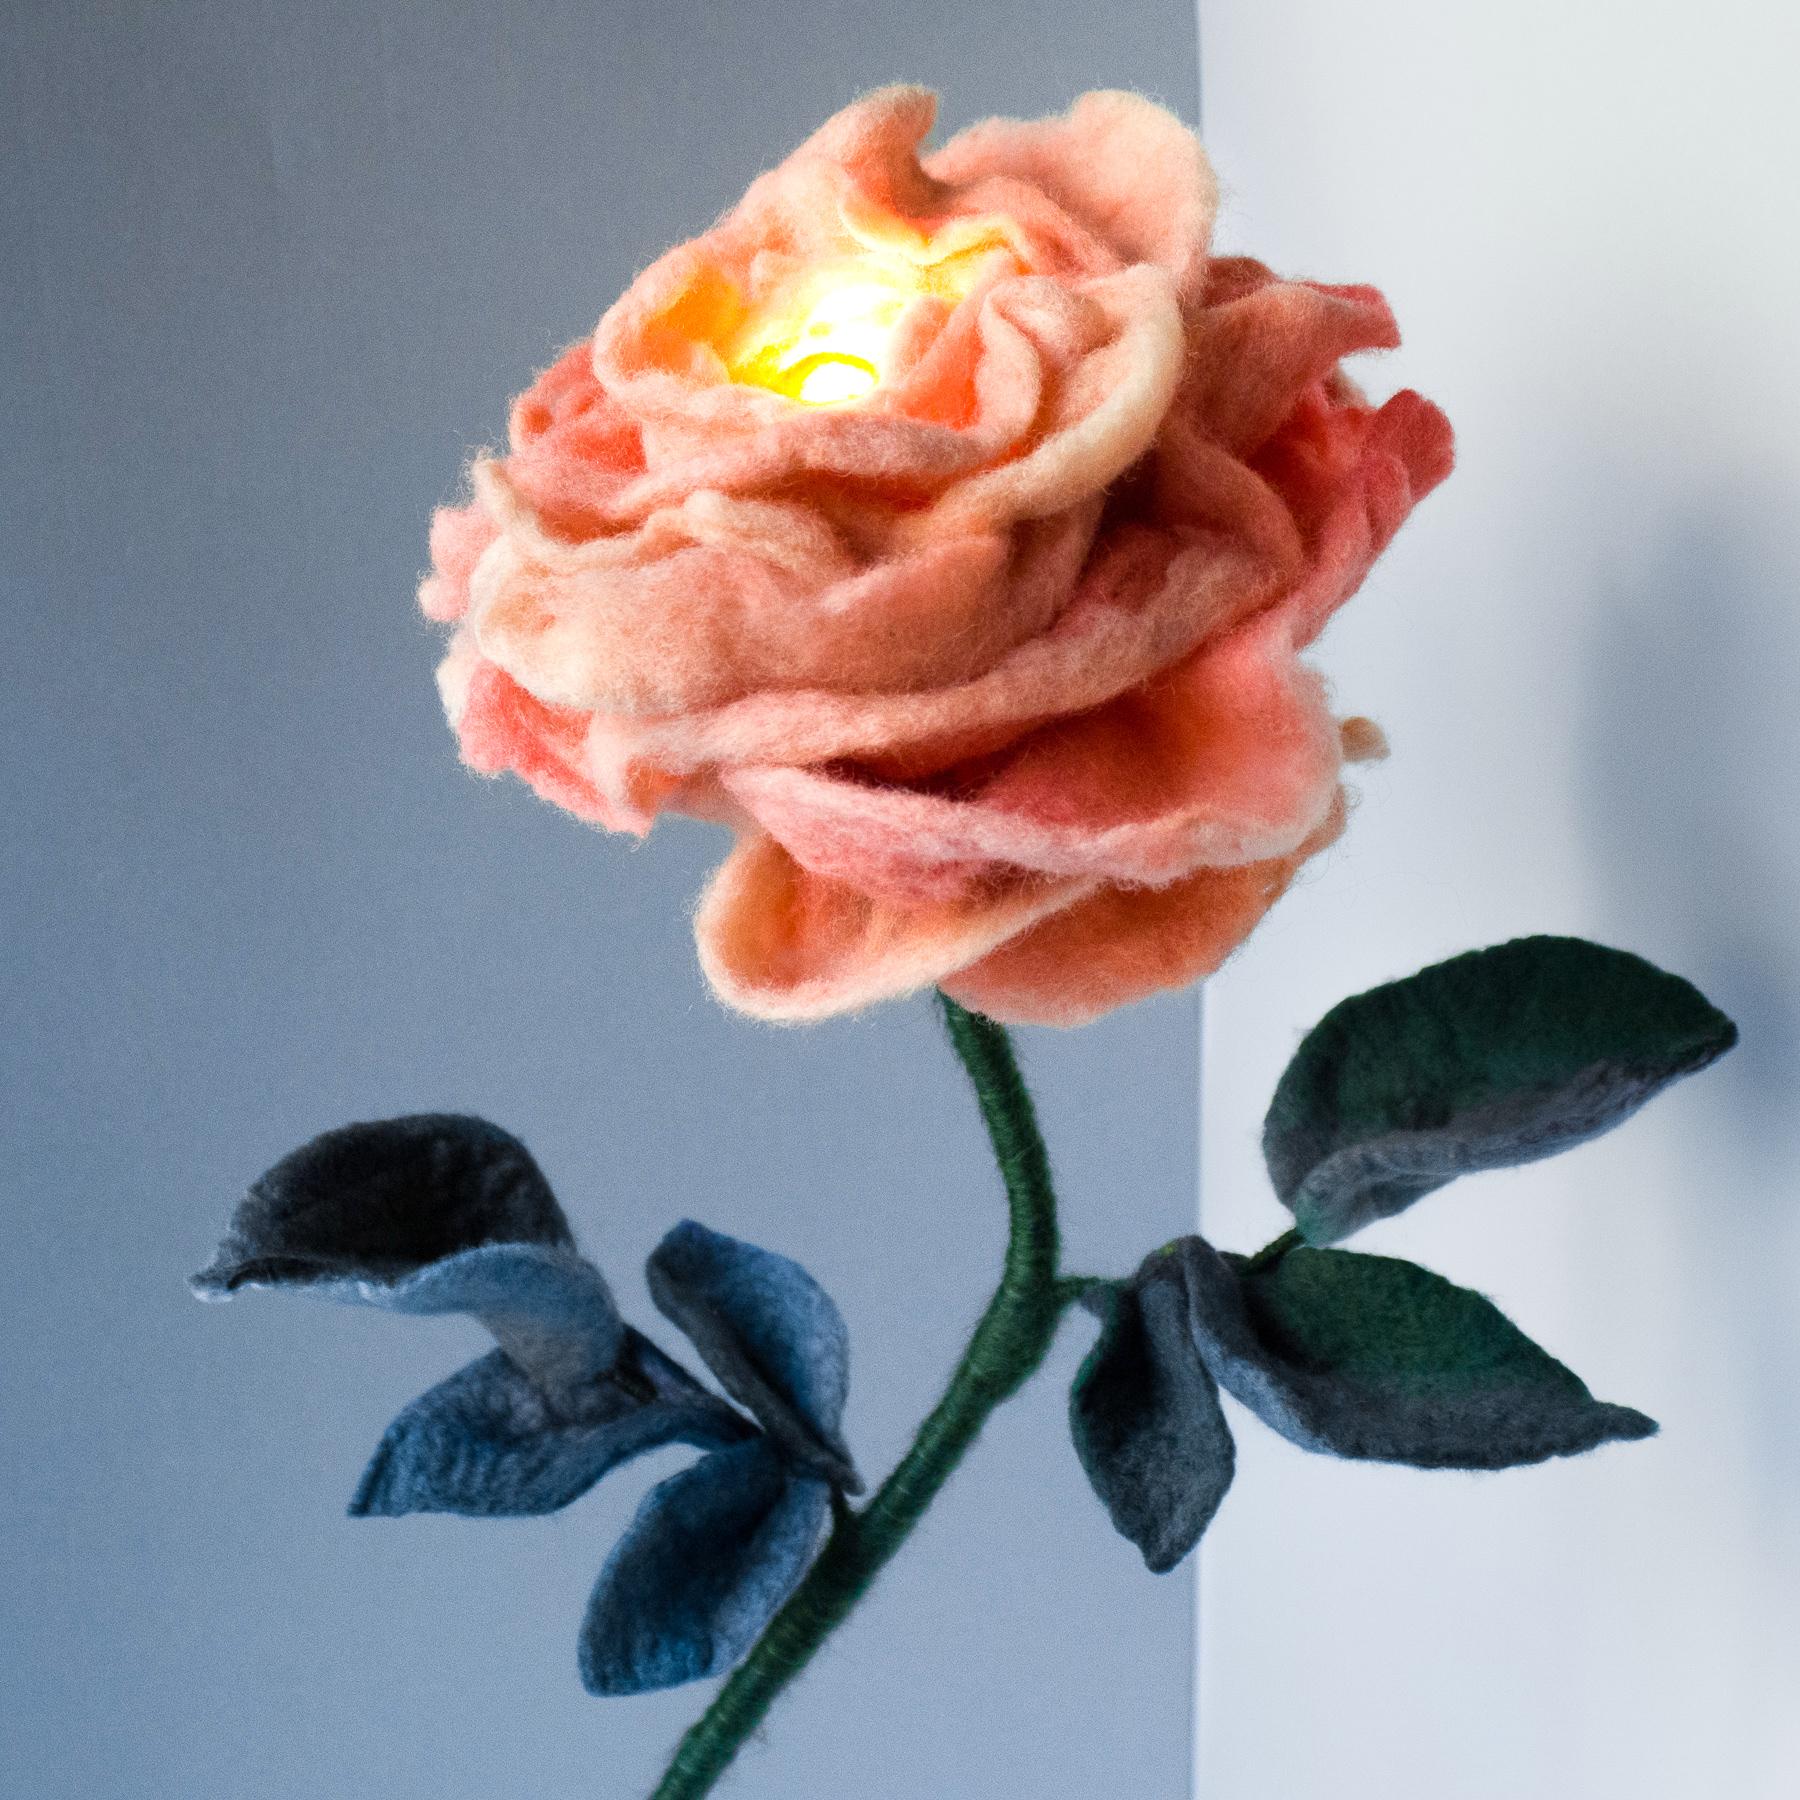 felt-flower-lamp_Peach_Adelya-Tumasyeva_1_1.jpg